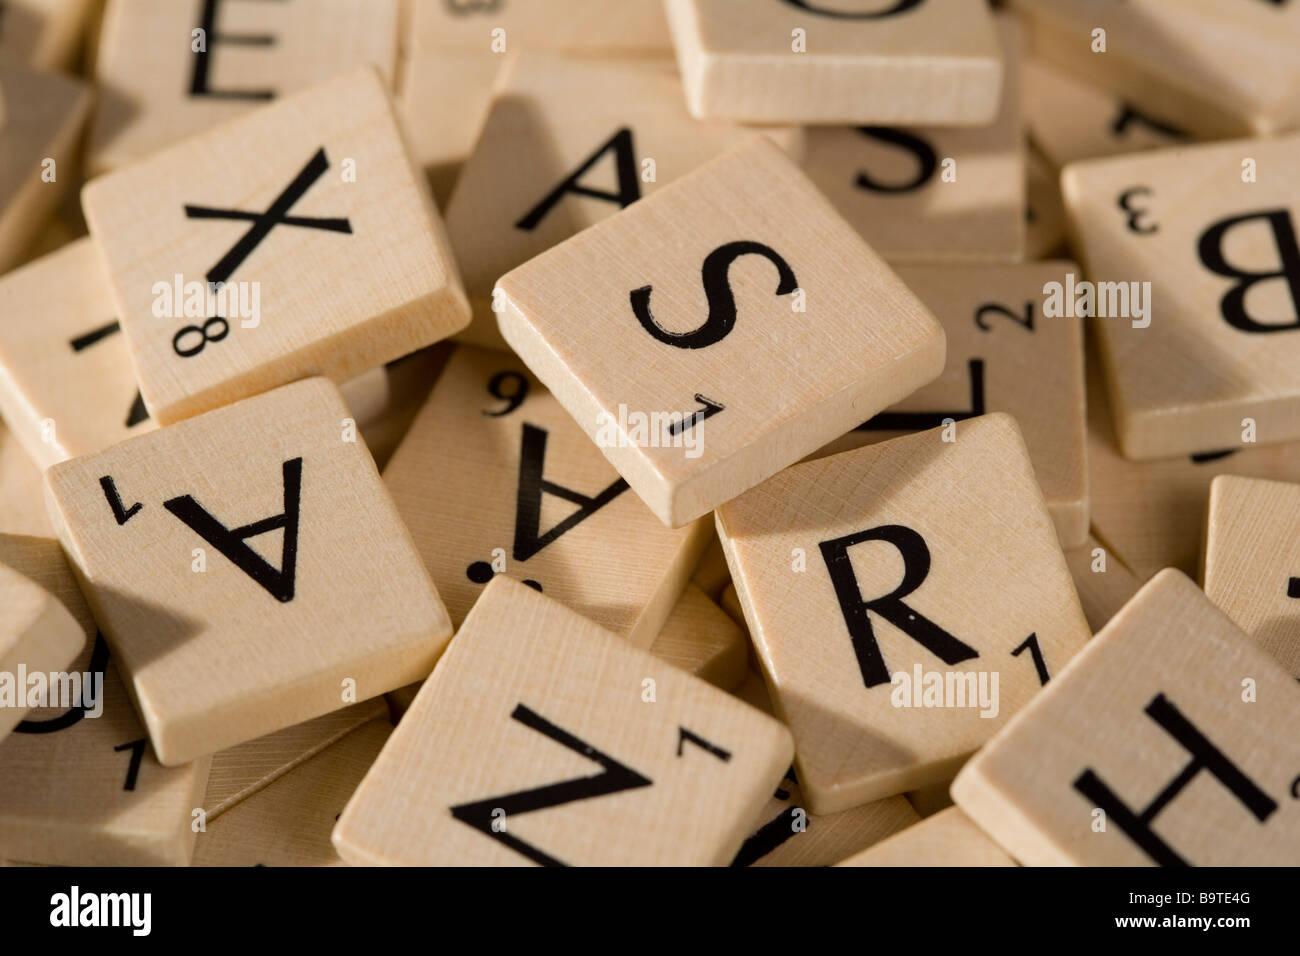 Scrabble trozos con numerosas cartas Imagen De Stock